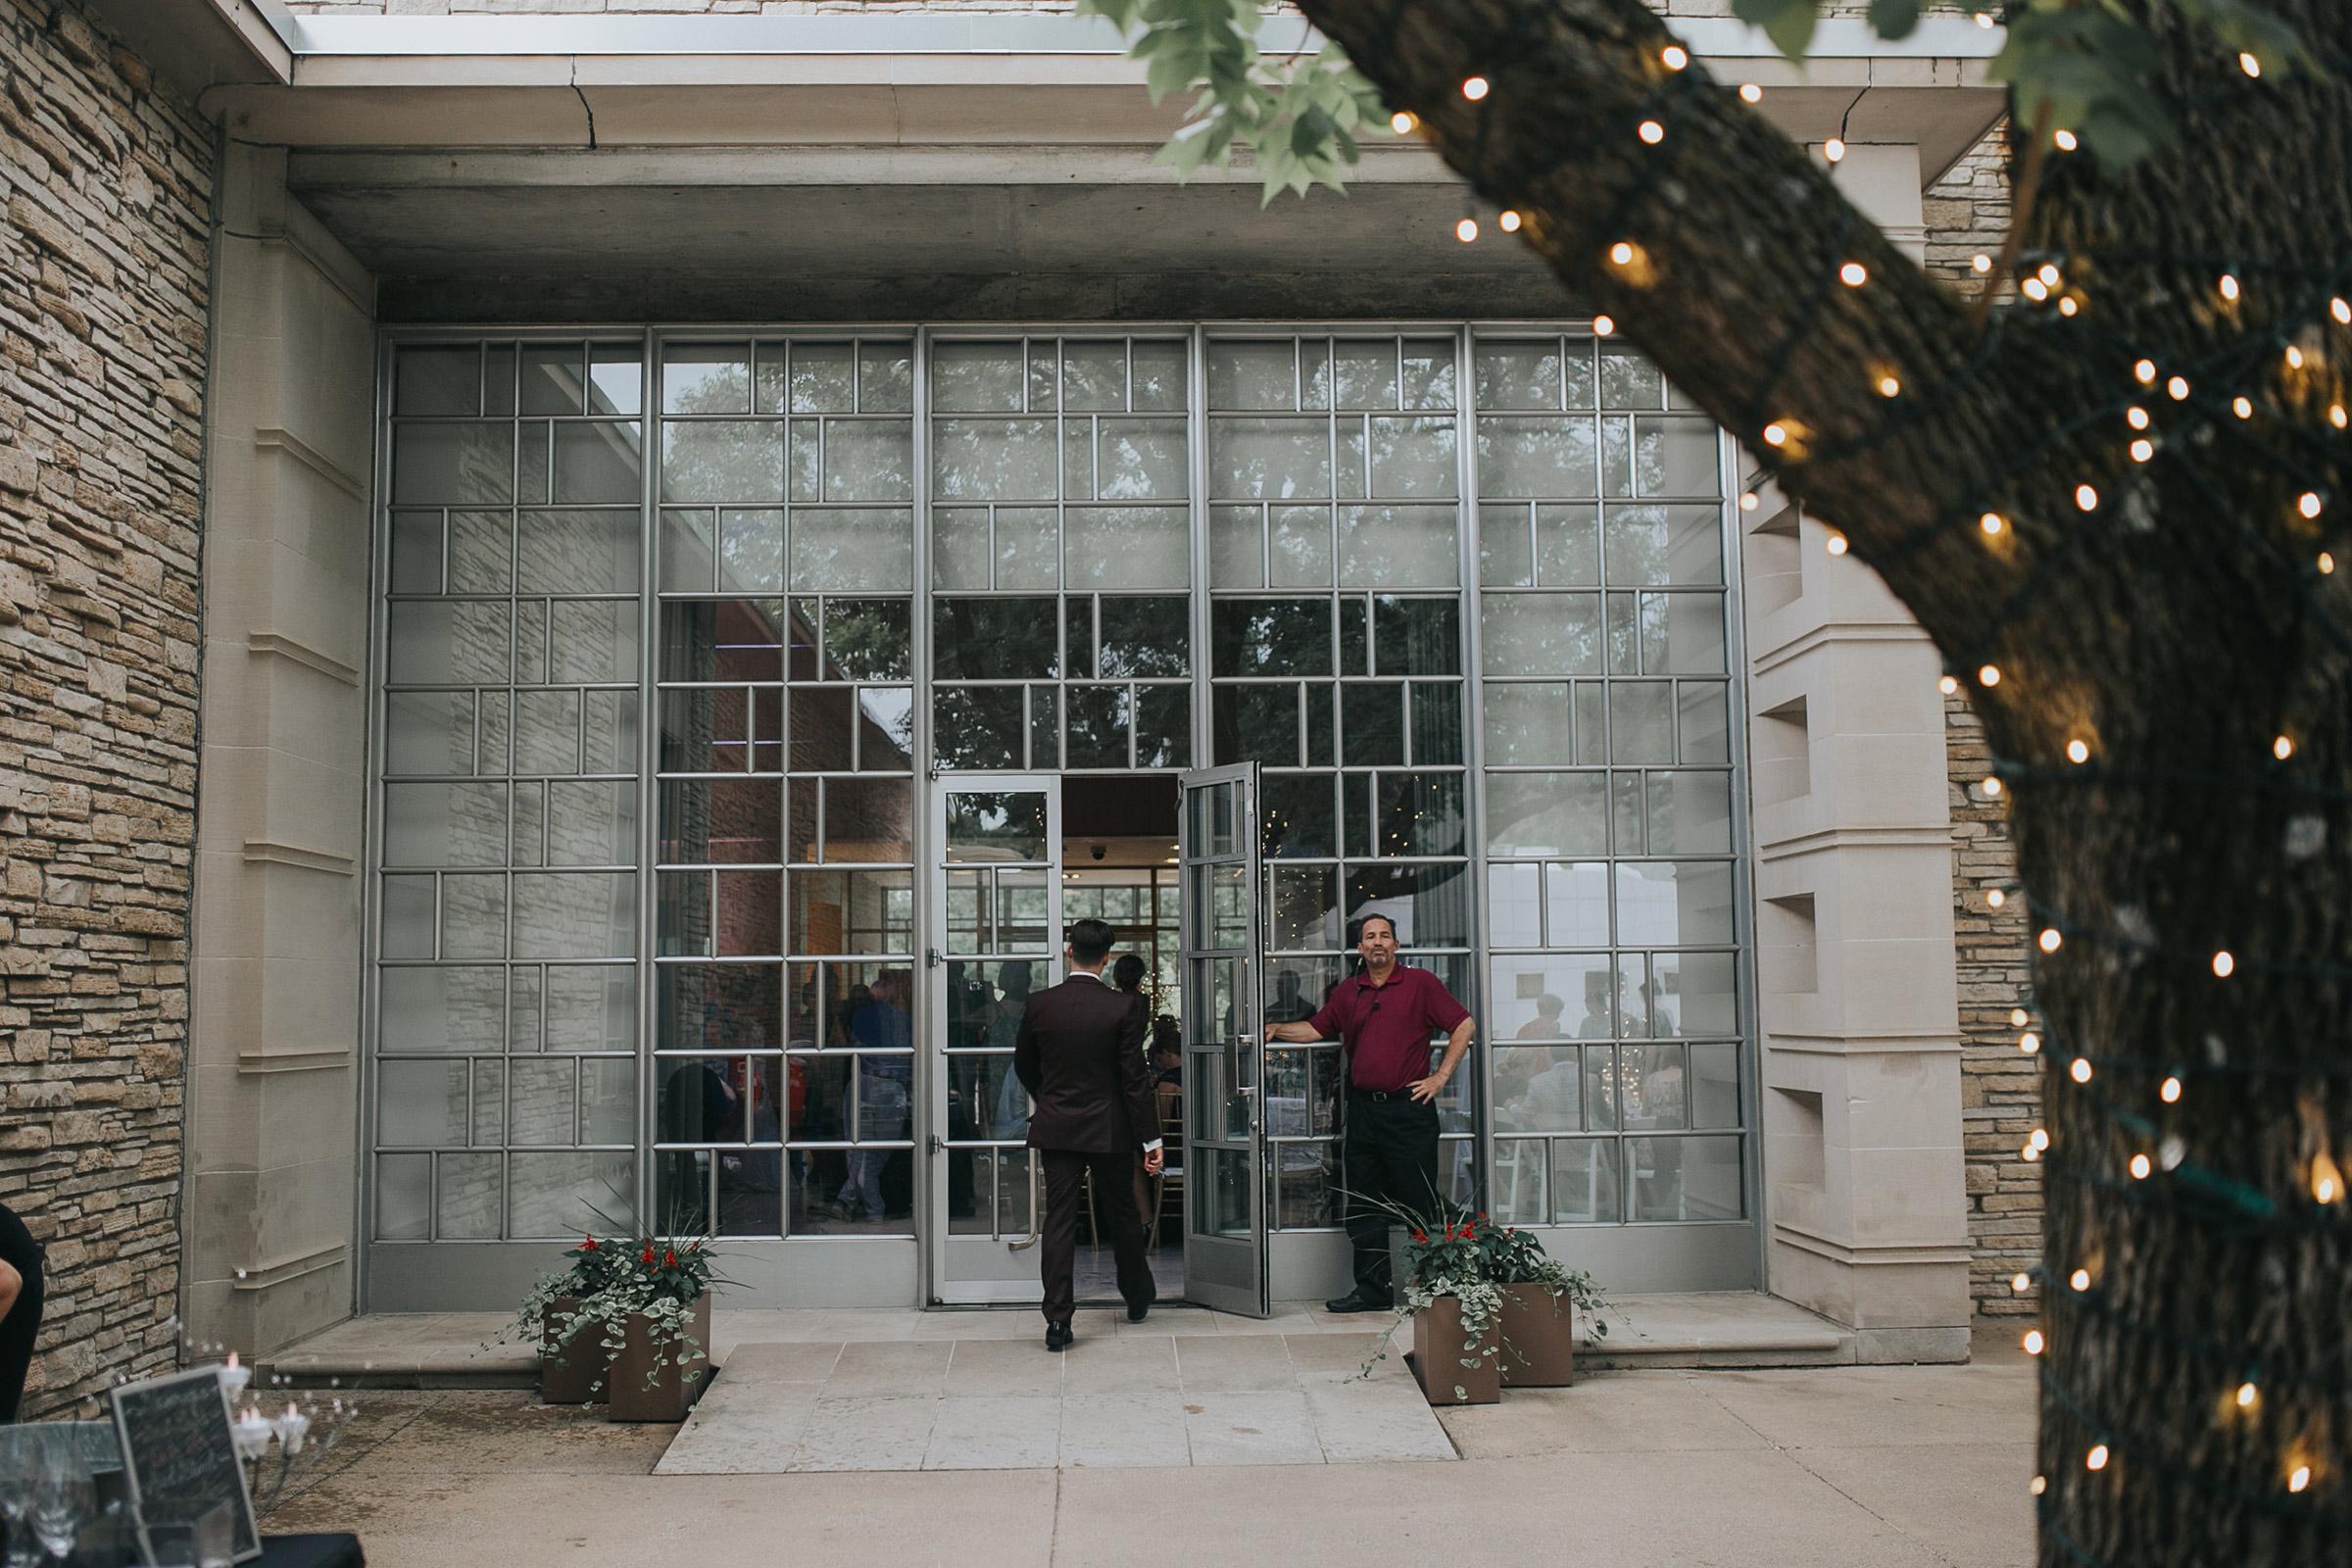 groom-walking-into-reception-from-courtyard-desmoines-iowa-art-center-raelyn-ramey-photography.jpg